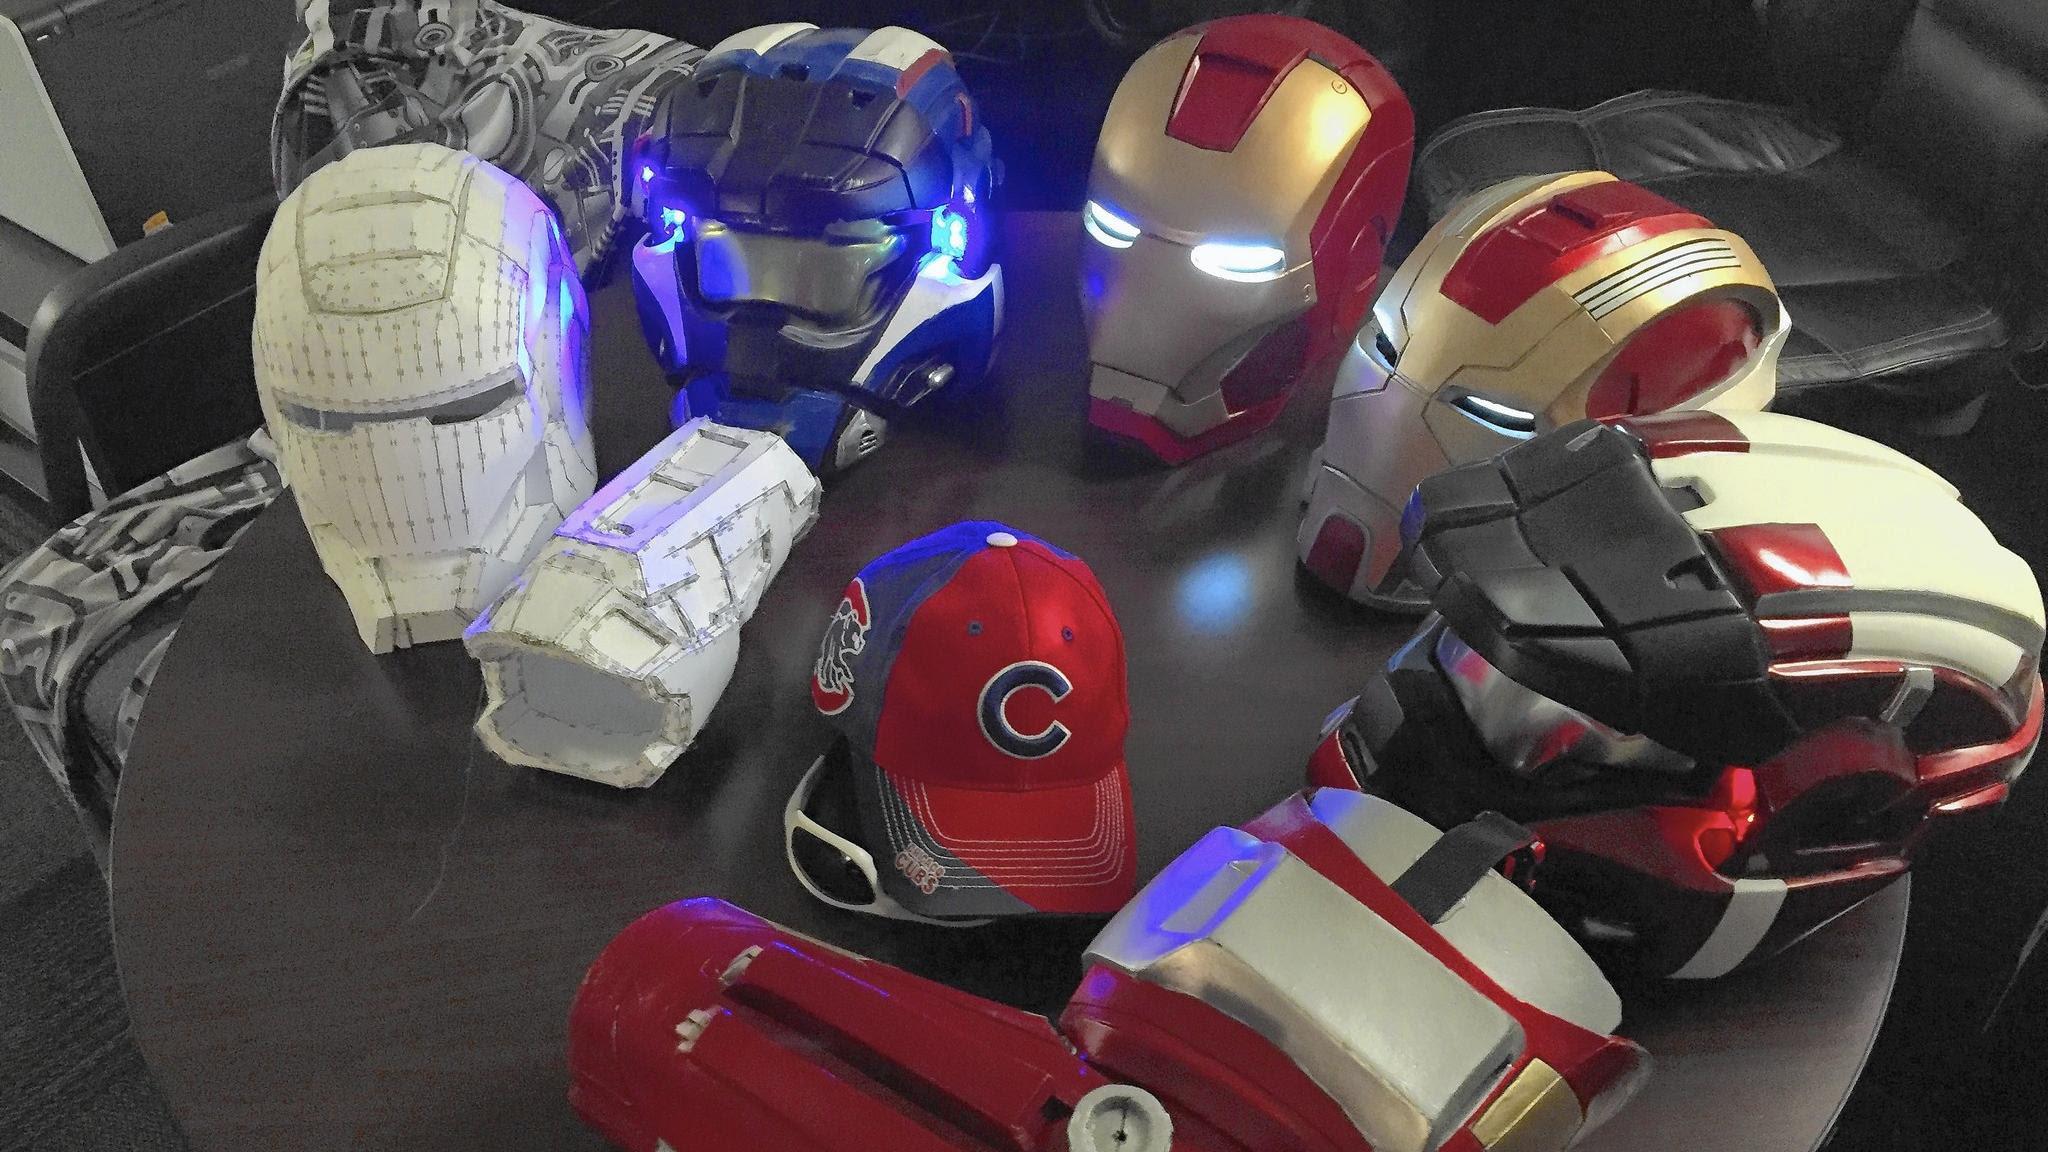 Cosplay Heroes For Cosplayers Iron Man Helmet Shop